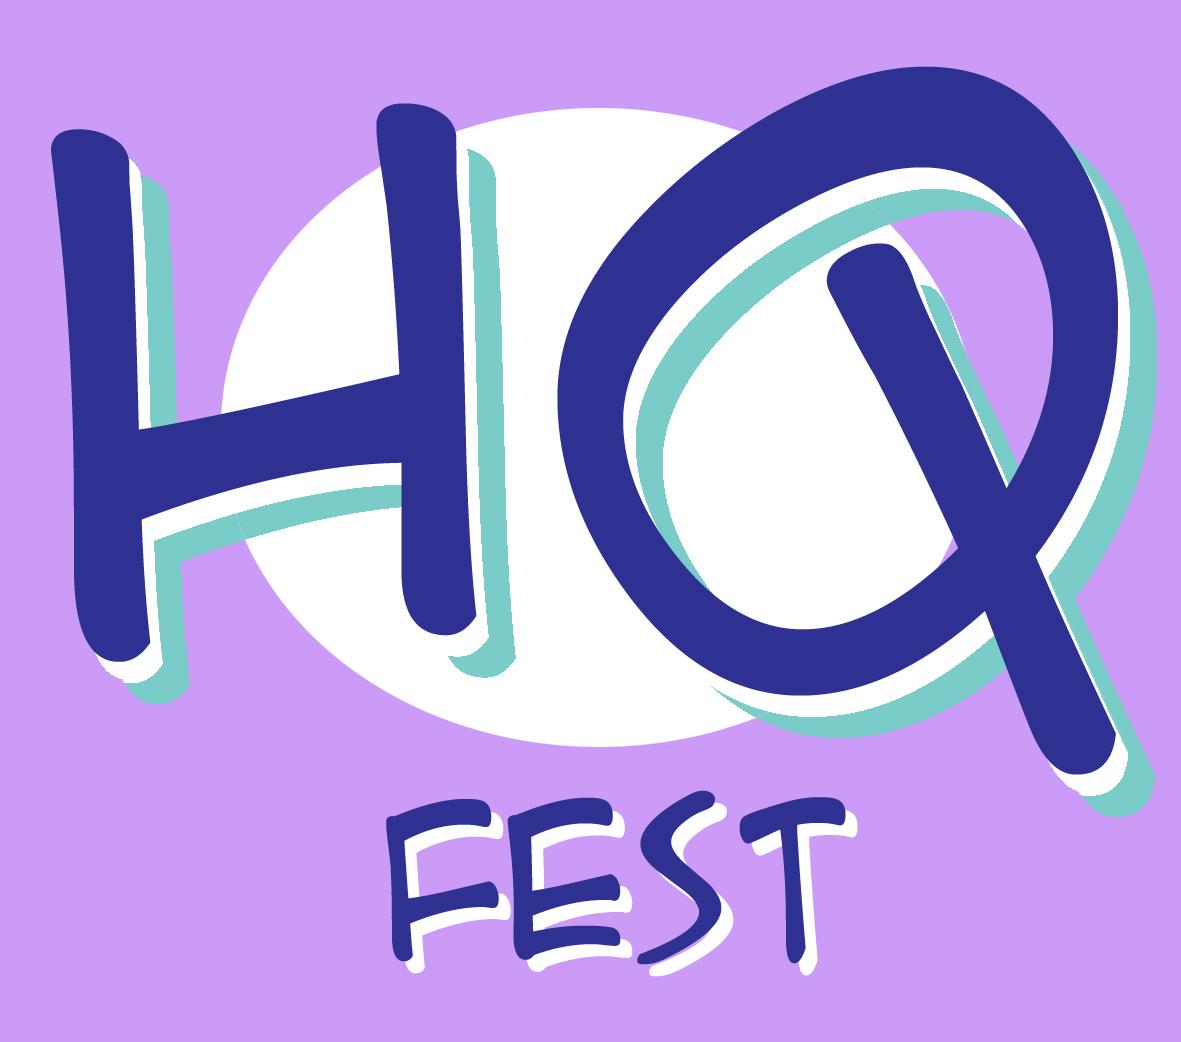 HQ FEST - EVENTO